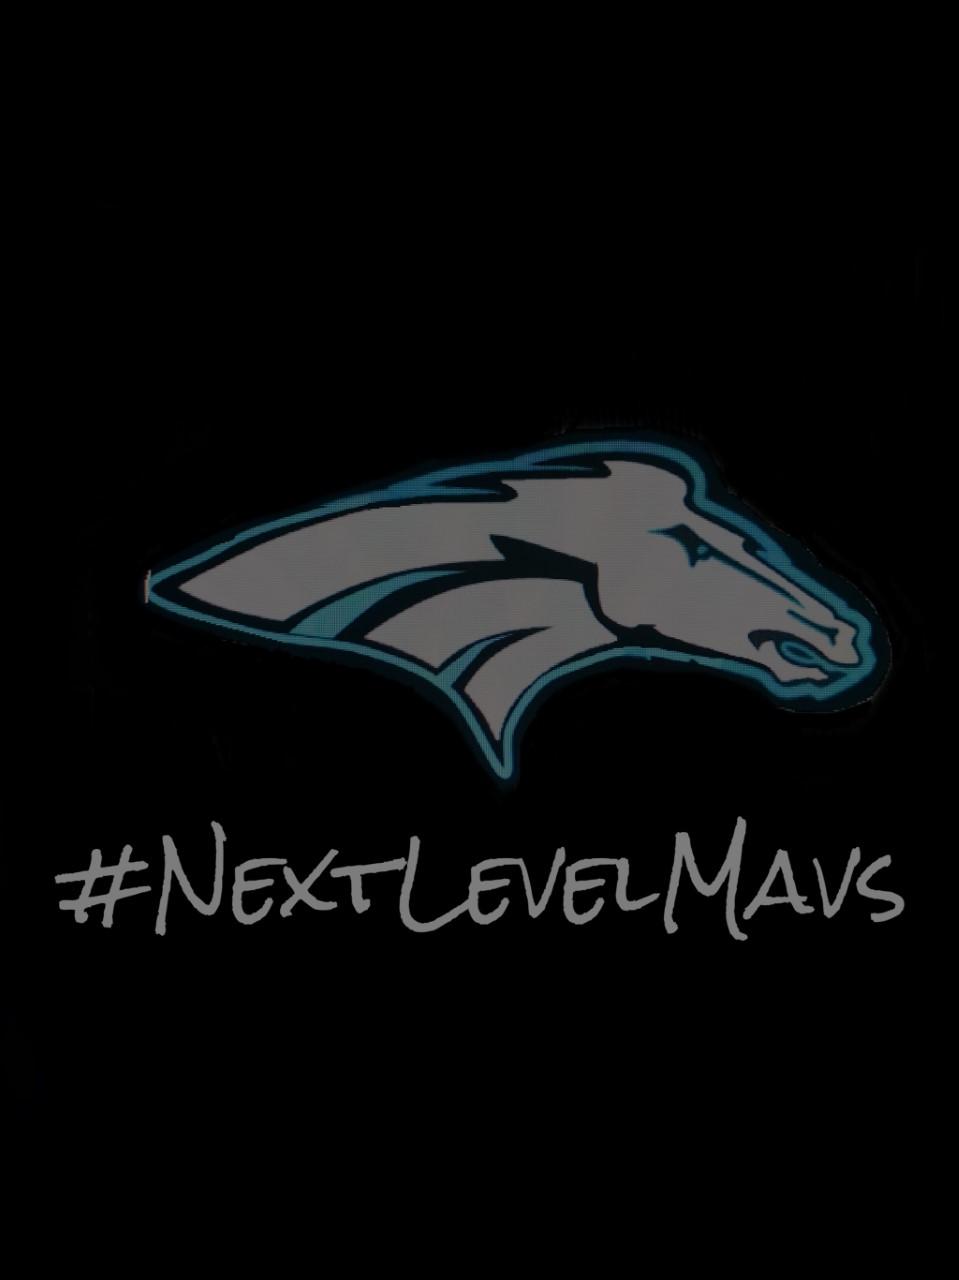 #NextLevelMavs